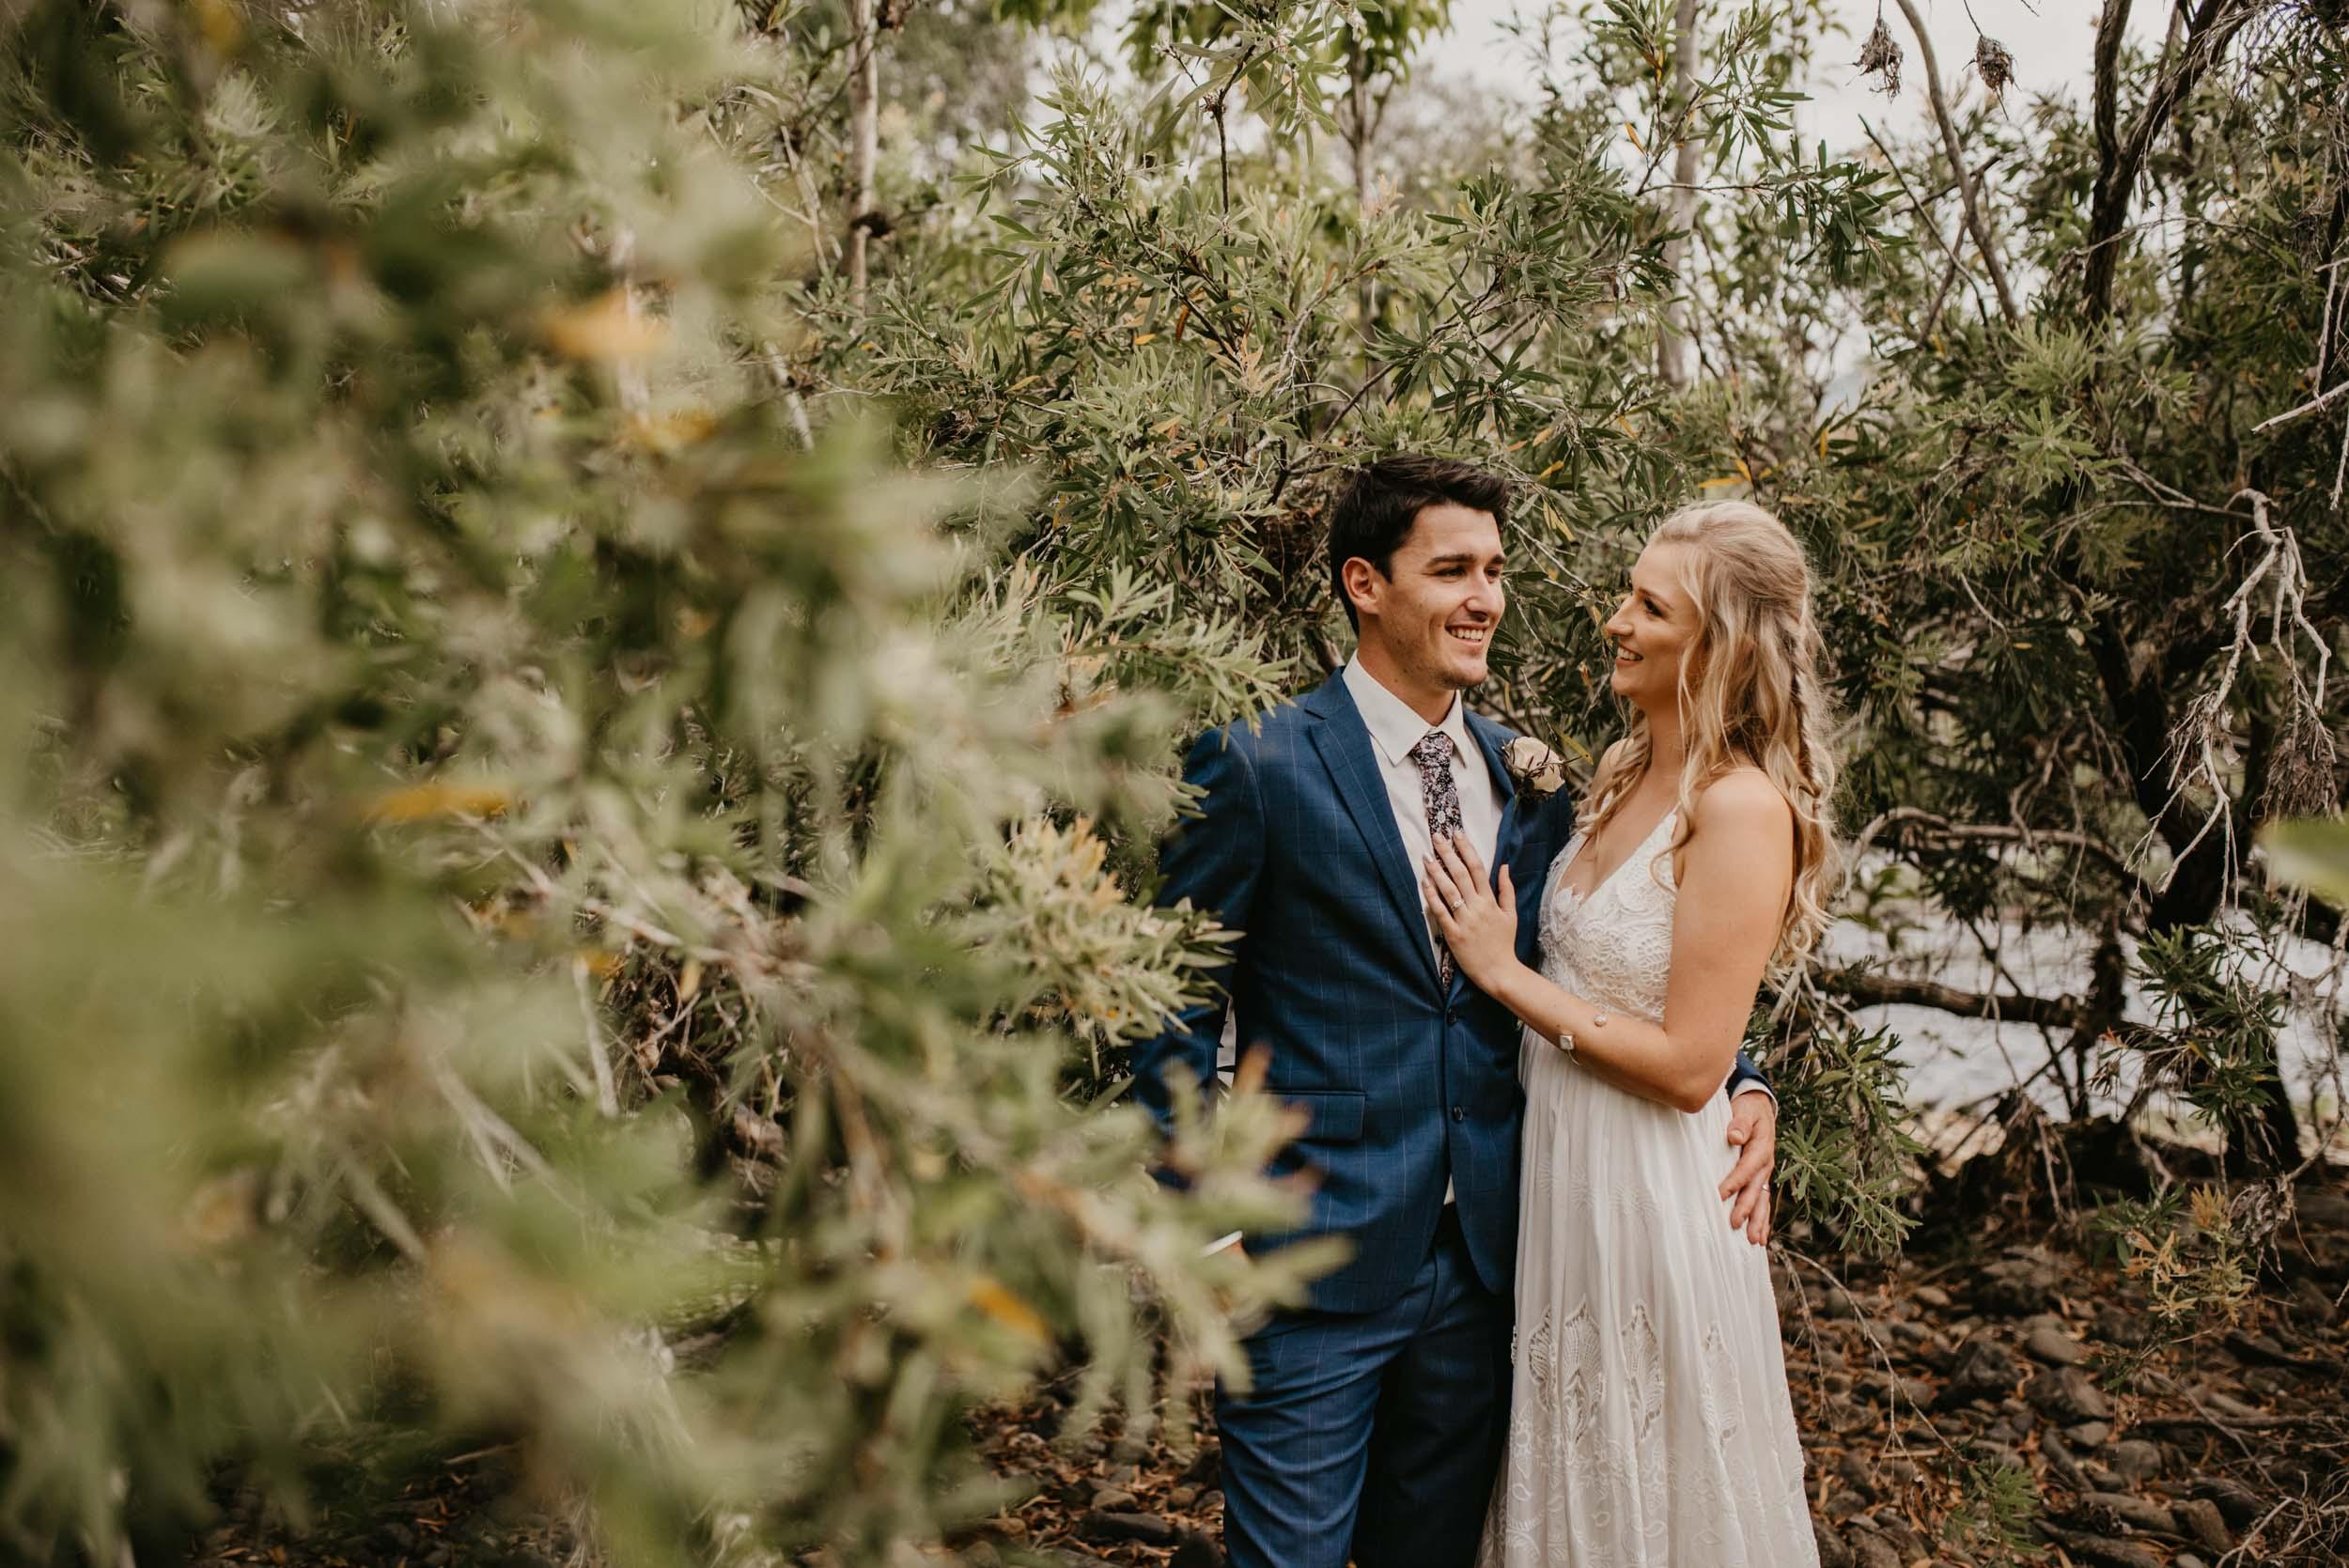 The Raw Photographer - Cairns Wedding Photographer - Laloli - Cairns Garden Wedding - Wedding Dress-61.jpg